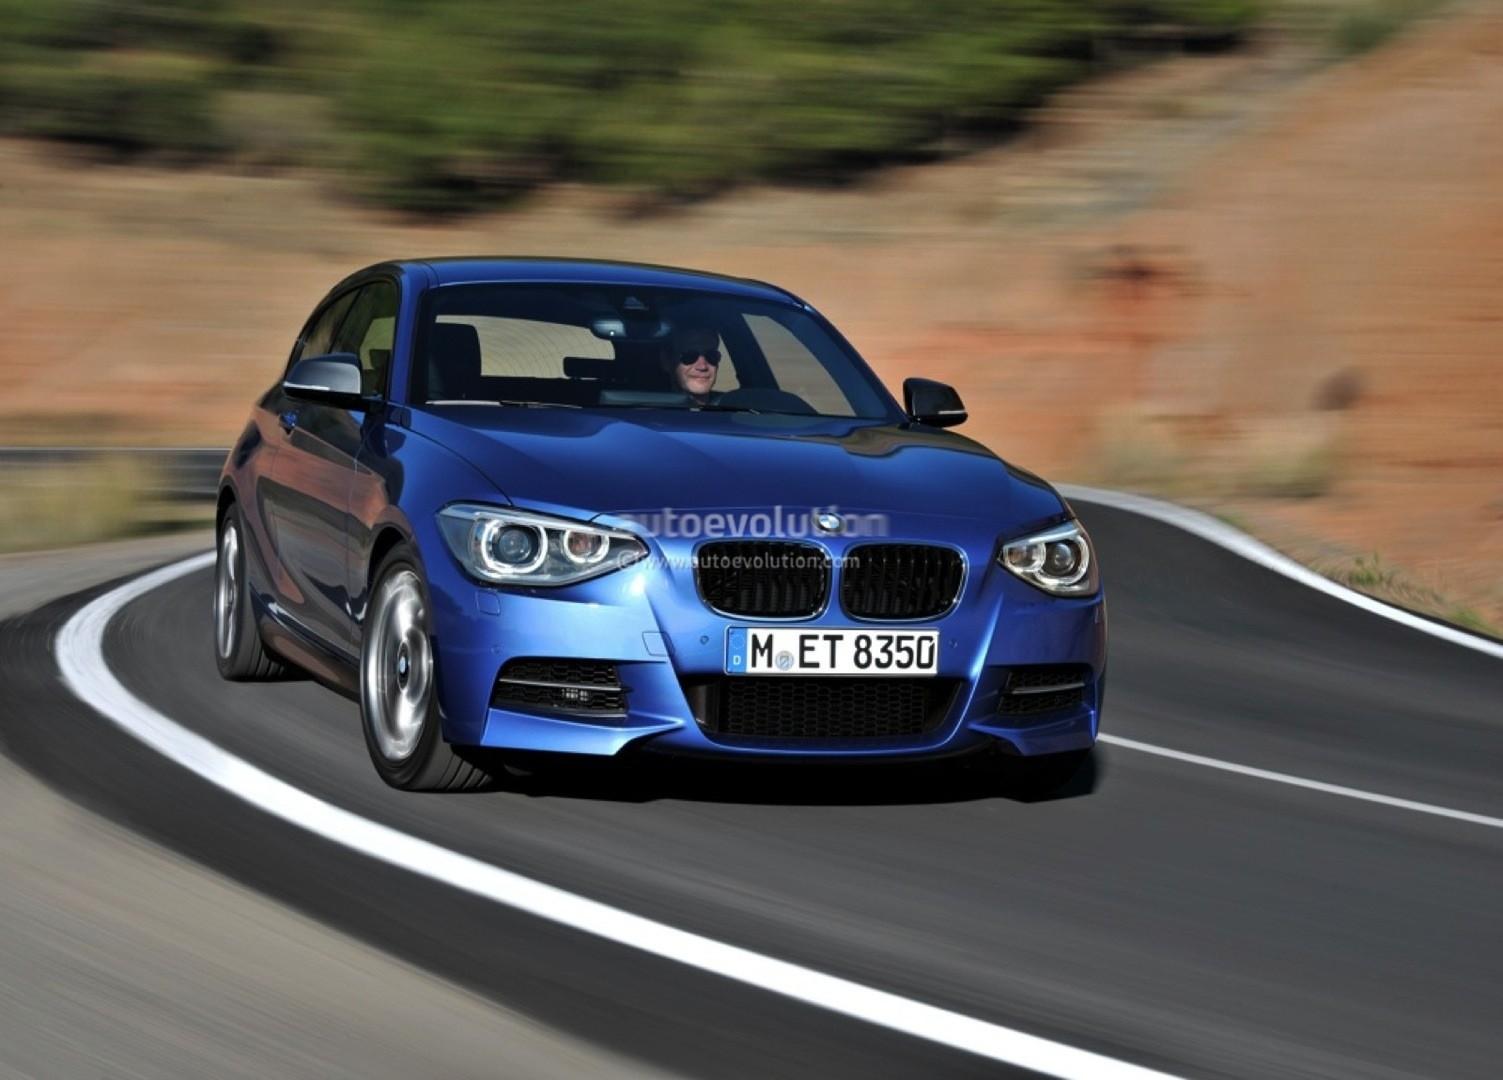 BMW F20 1 Series Hidden Menu Access DIY - autoevolution